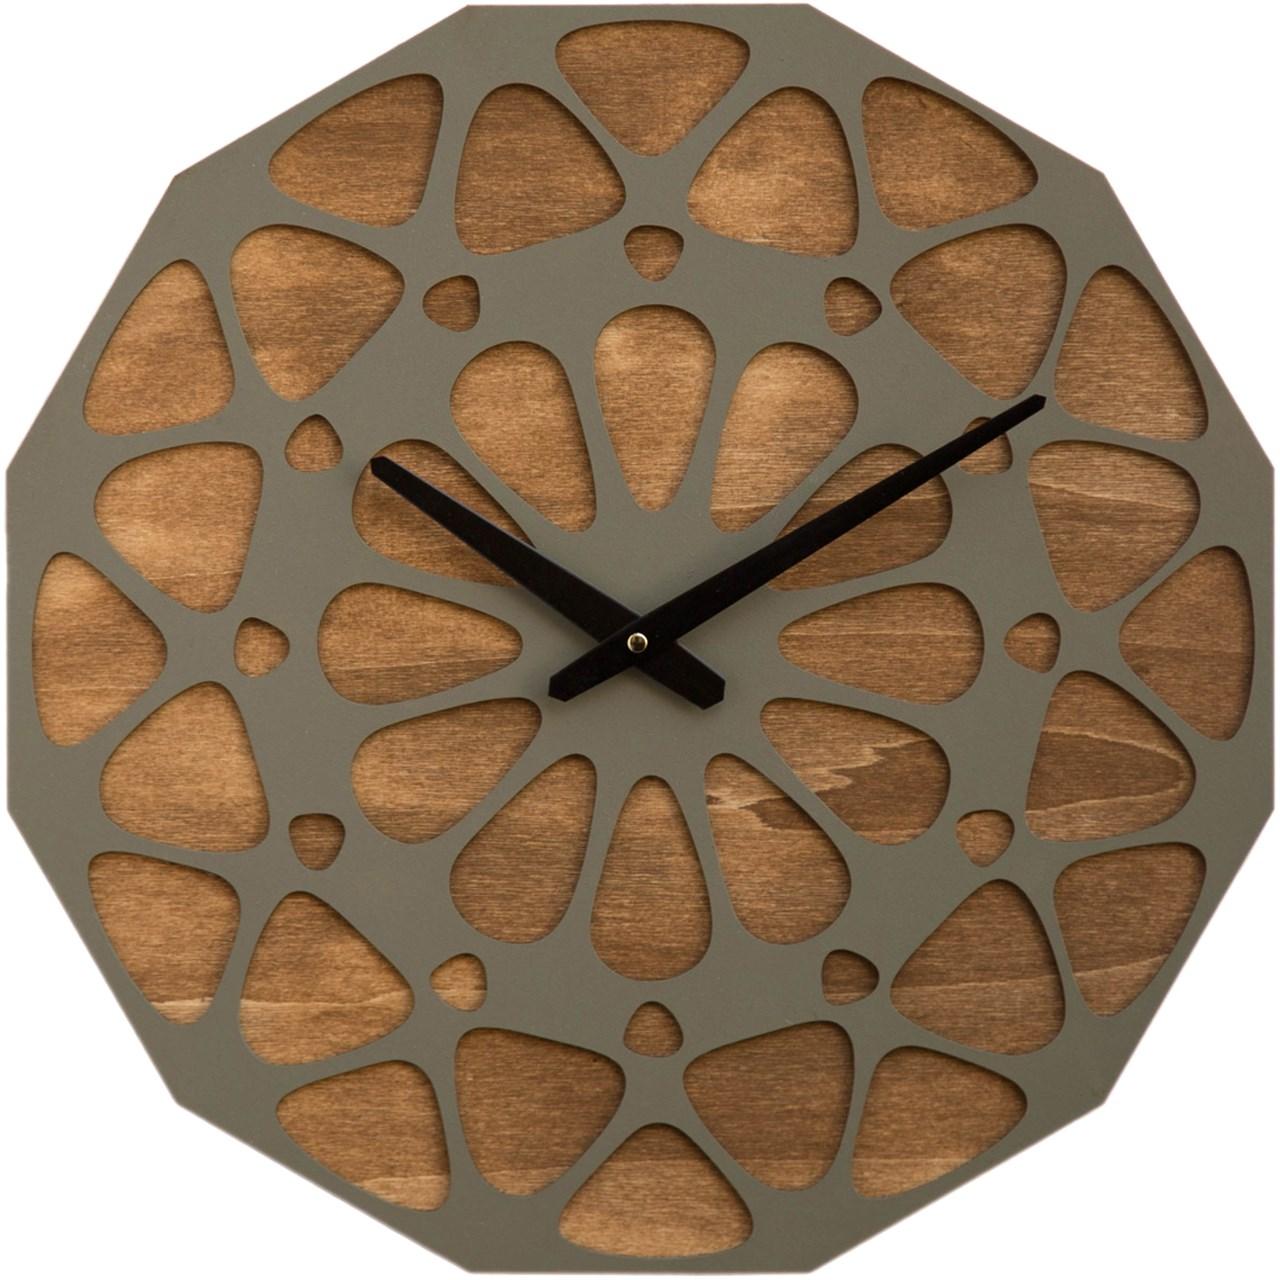 ساعت دیواری تکلاتایم مدل TT05G